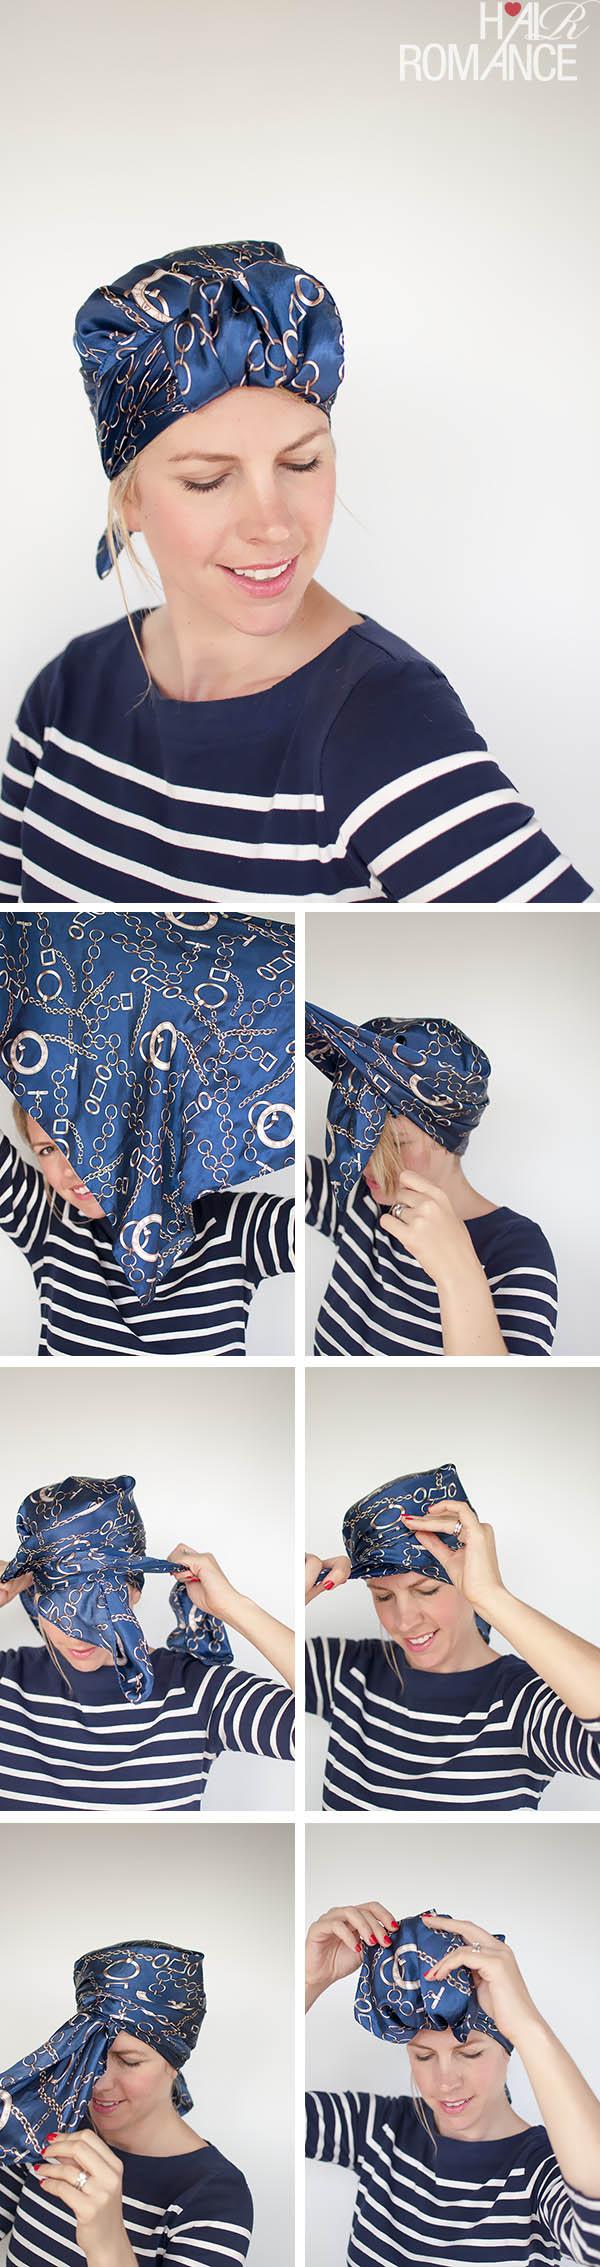 Hair Romance - Headscarf three ways - sleek urban turban